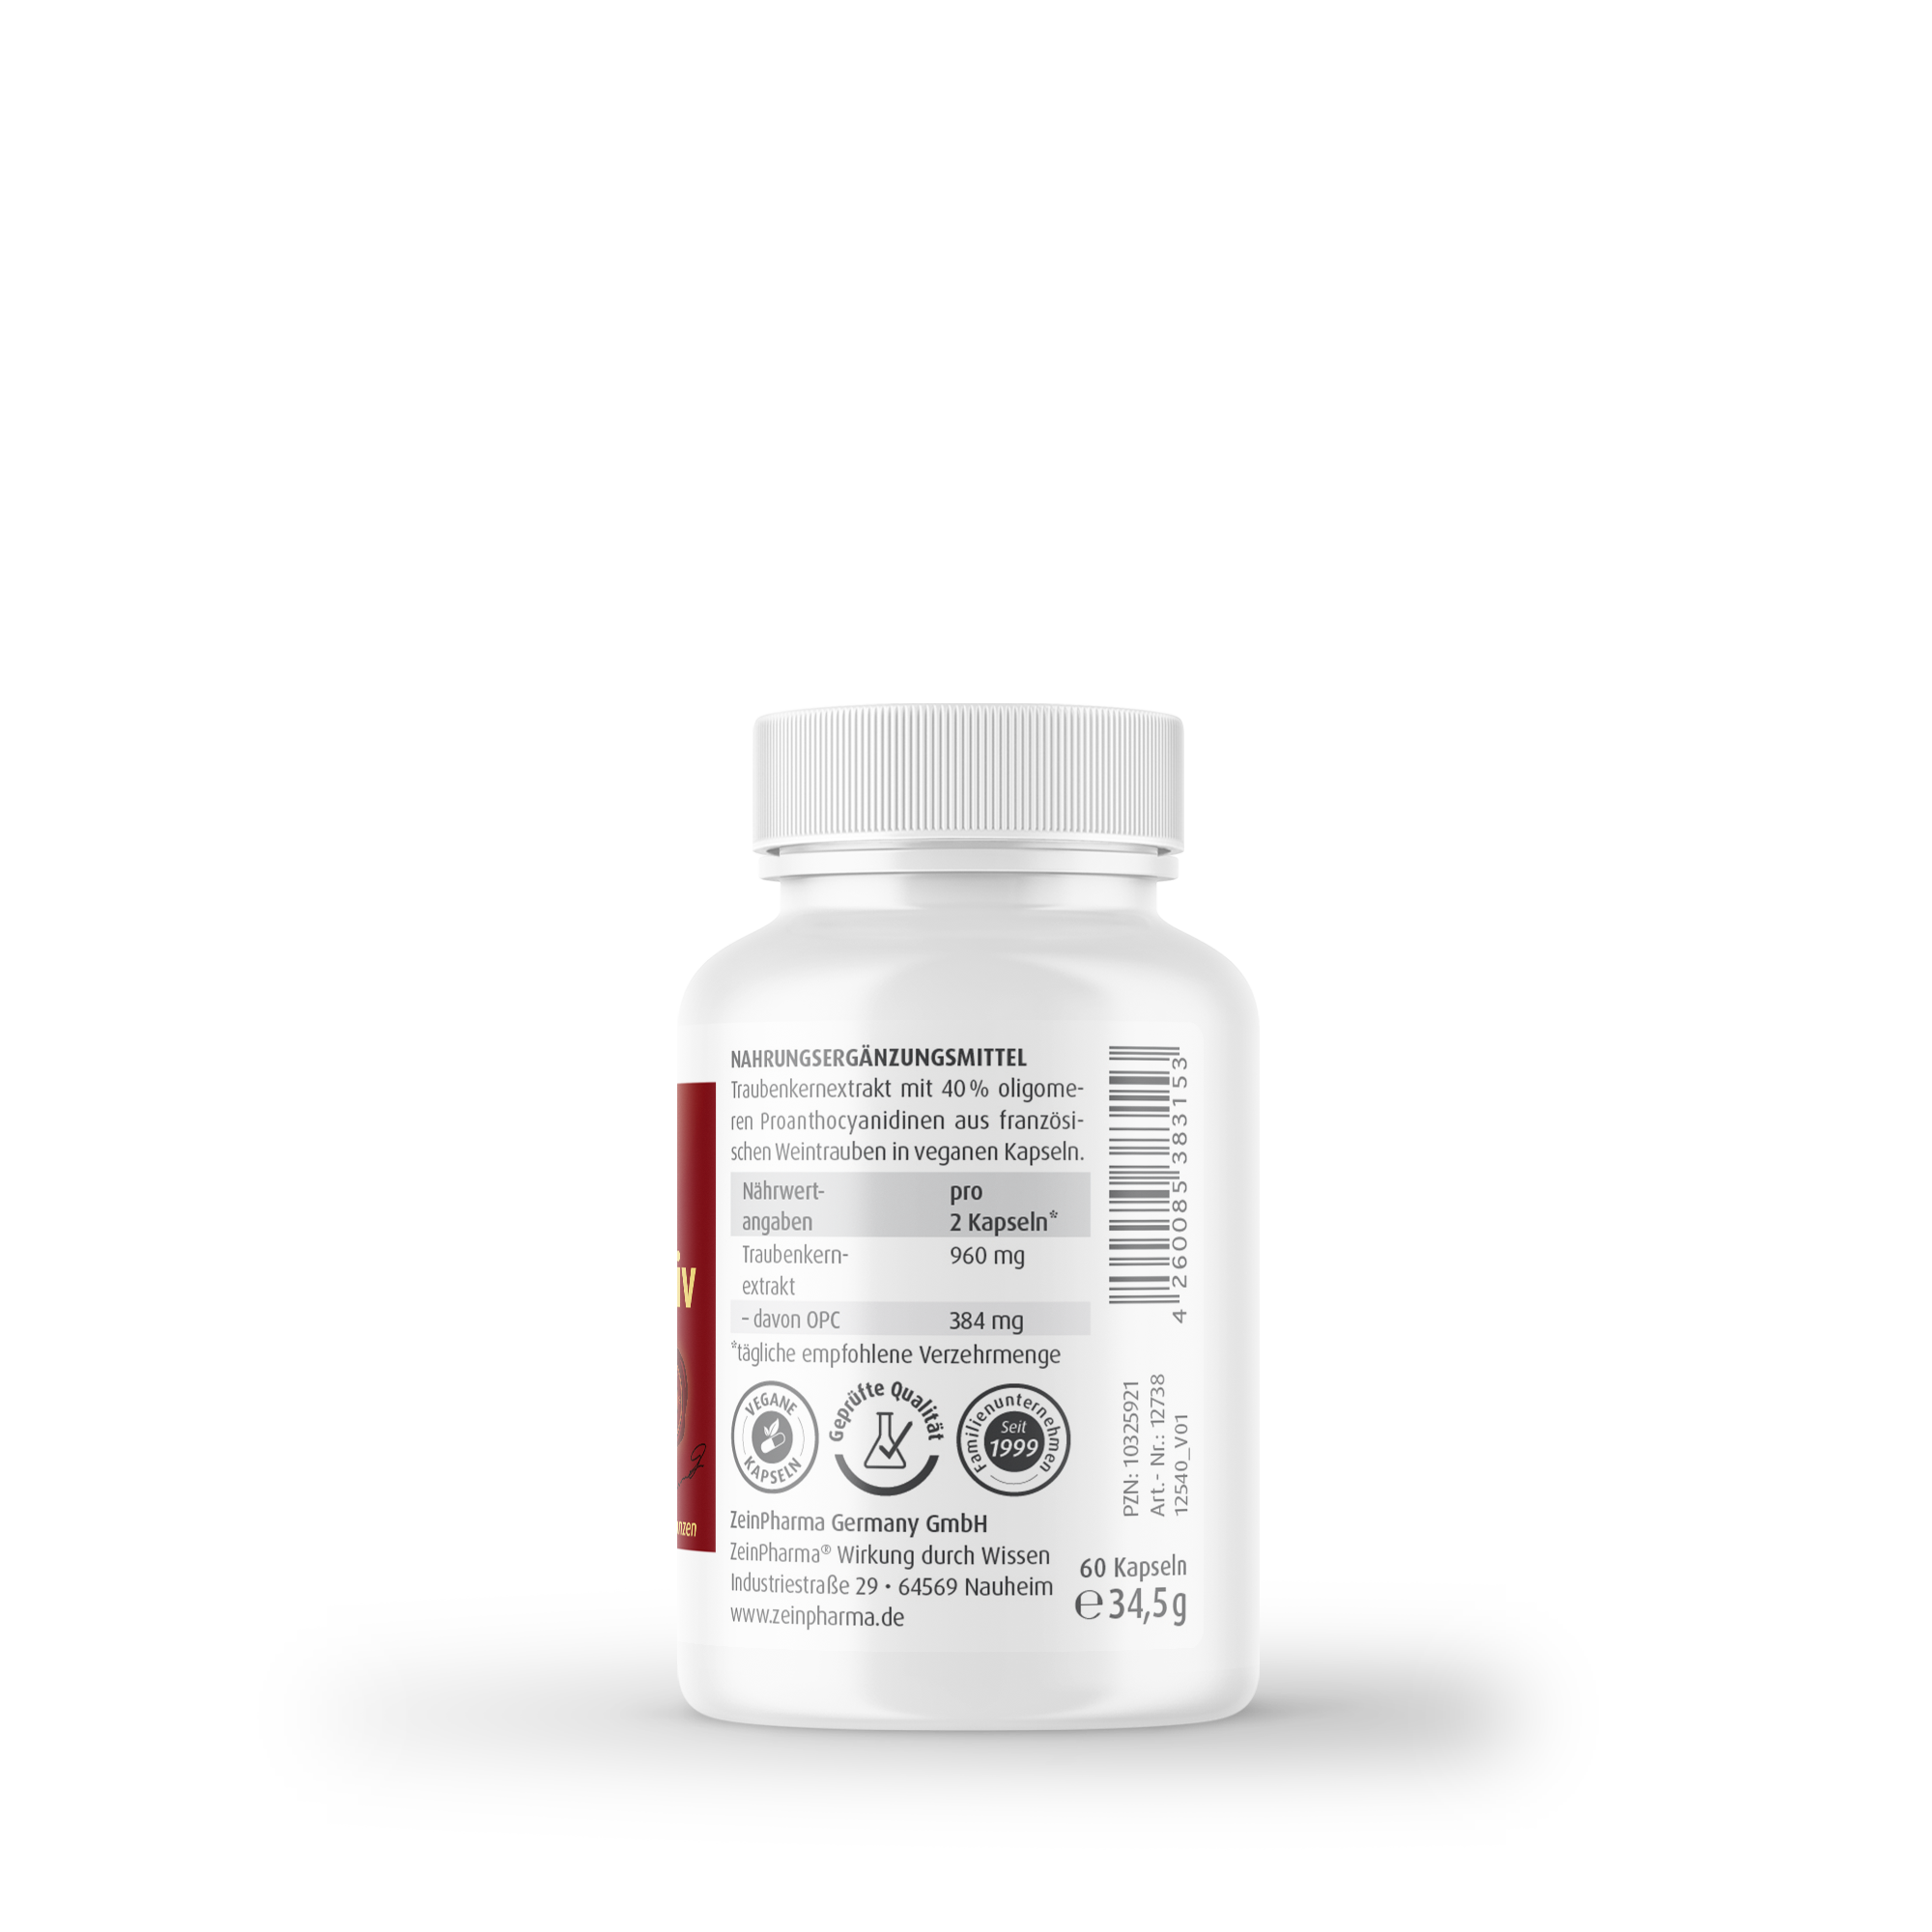 OPC nativ 192 mg